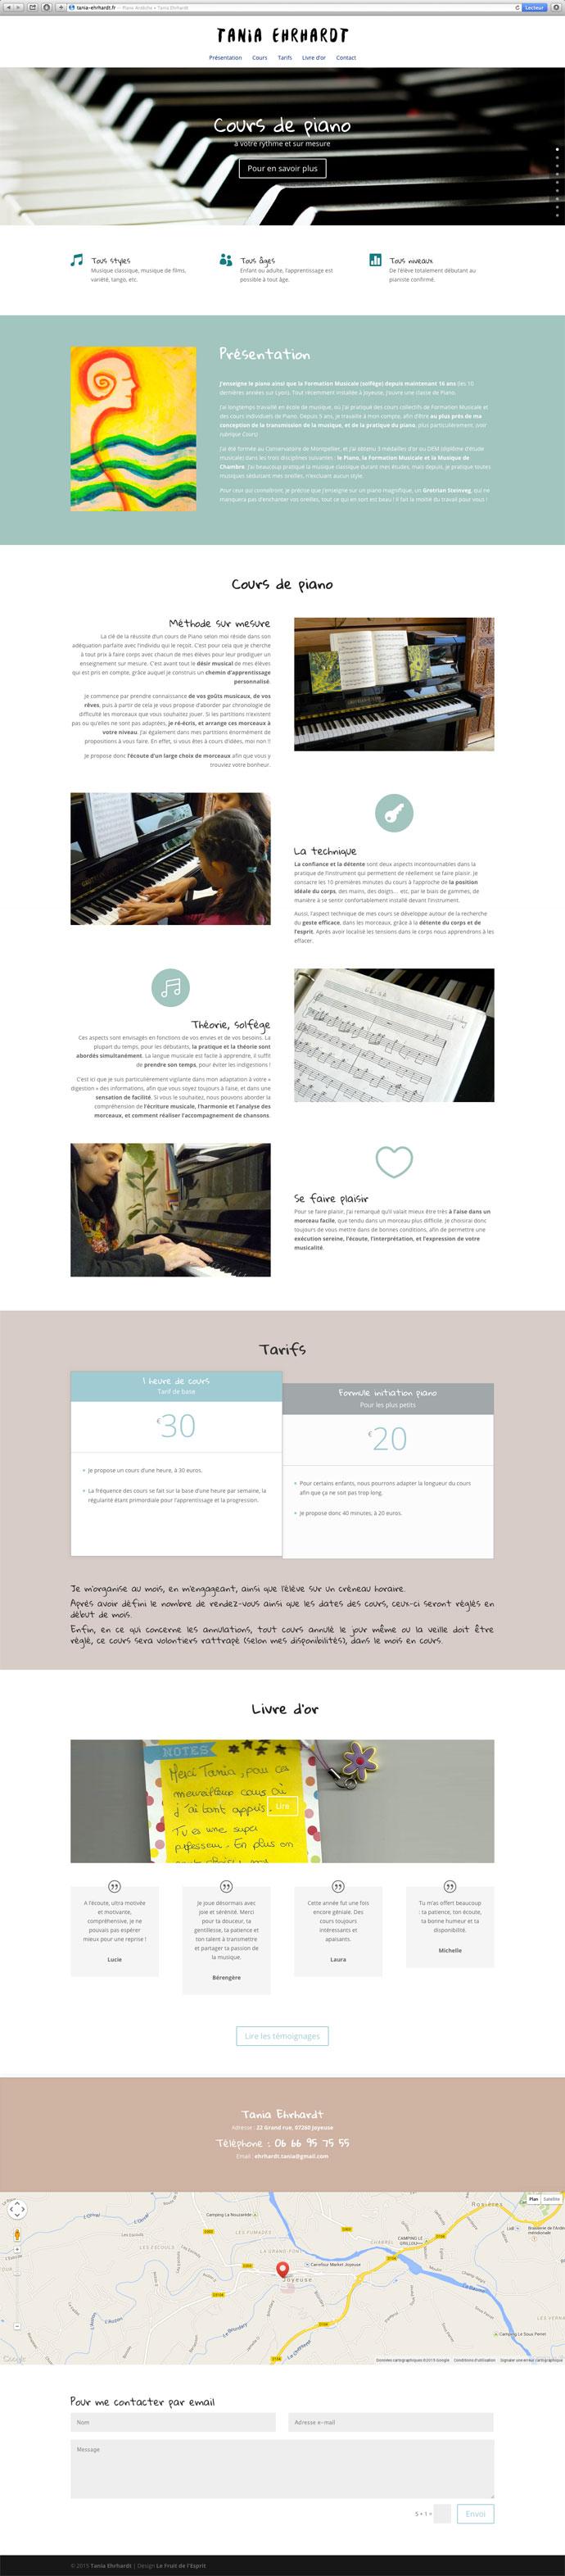 Tania Ehrhardt - Site Internet